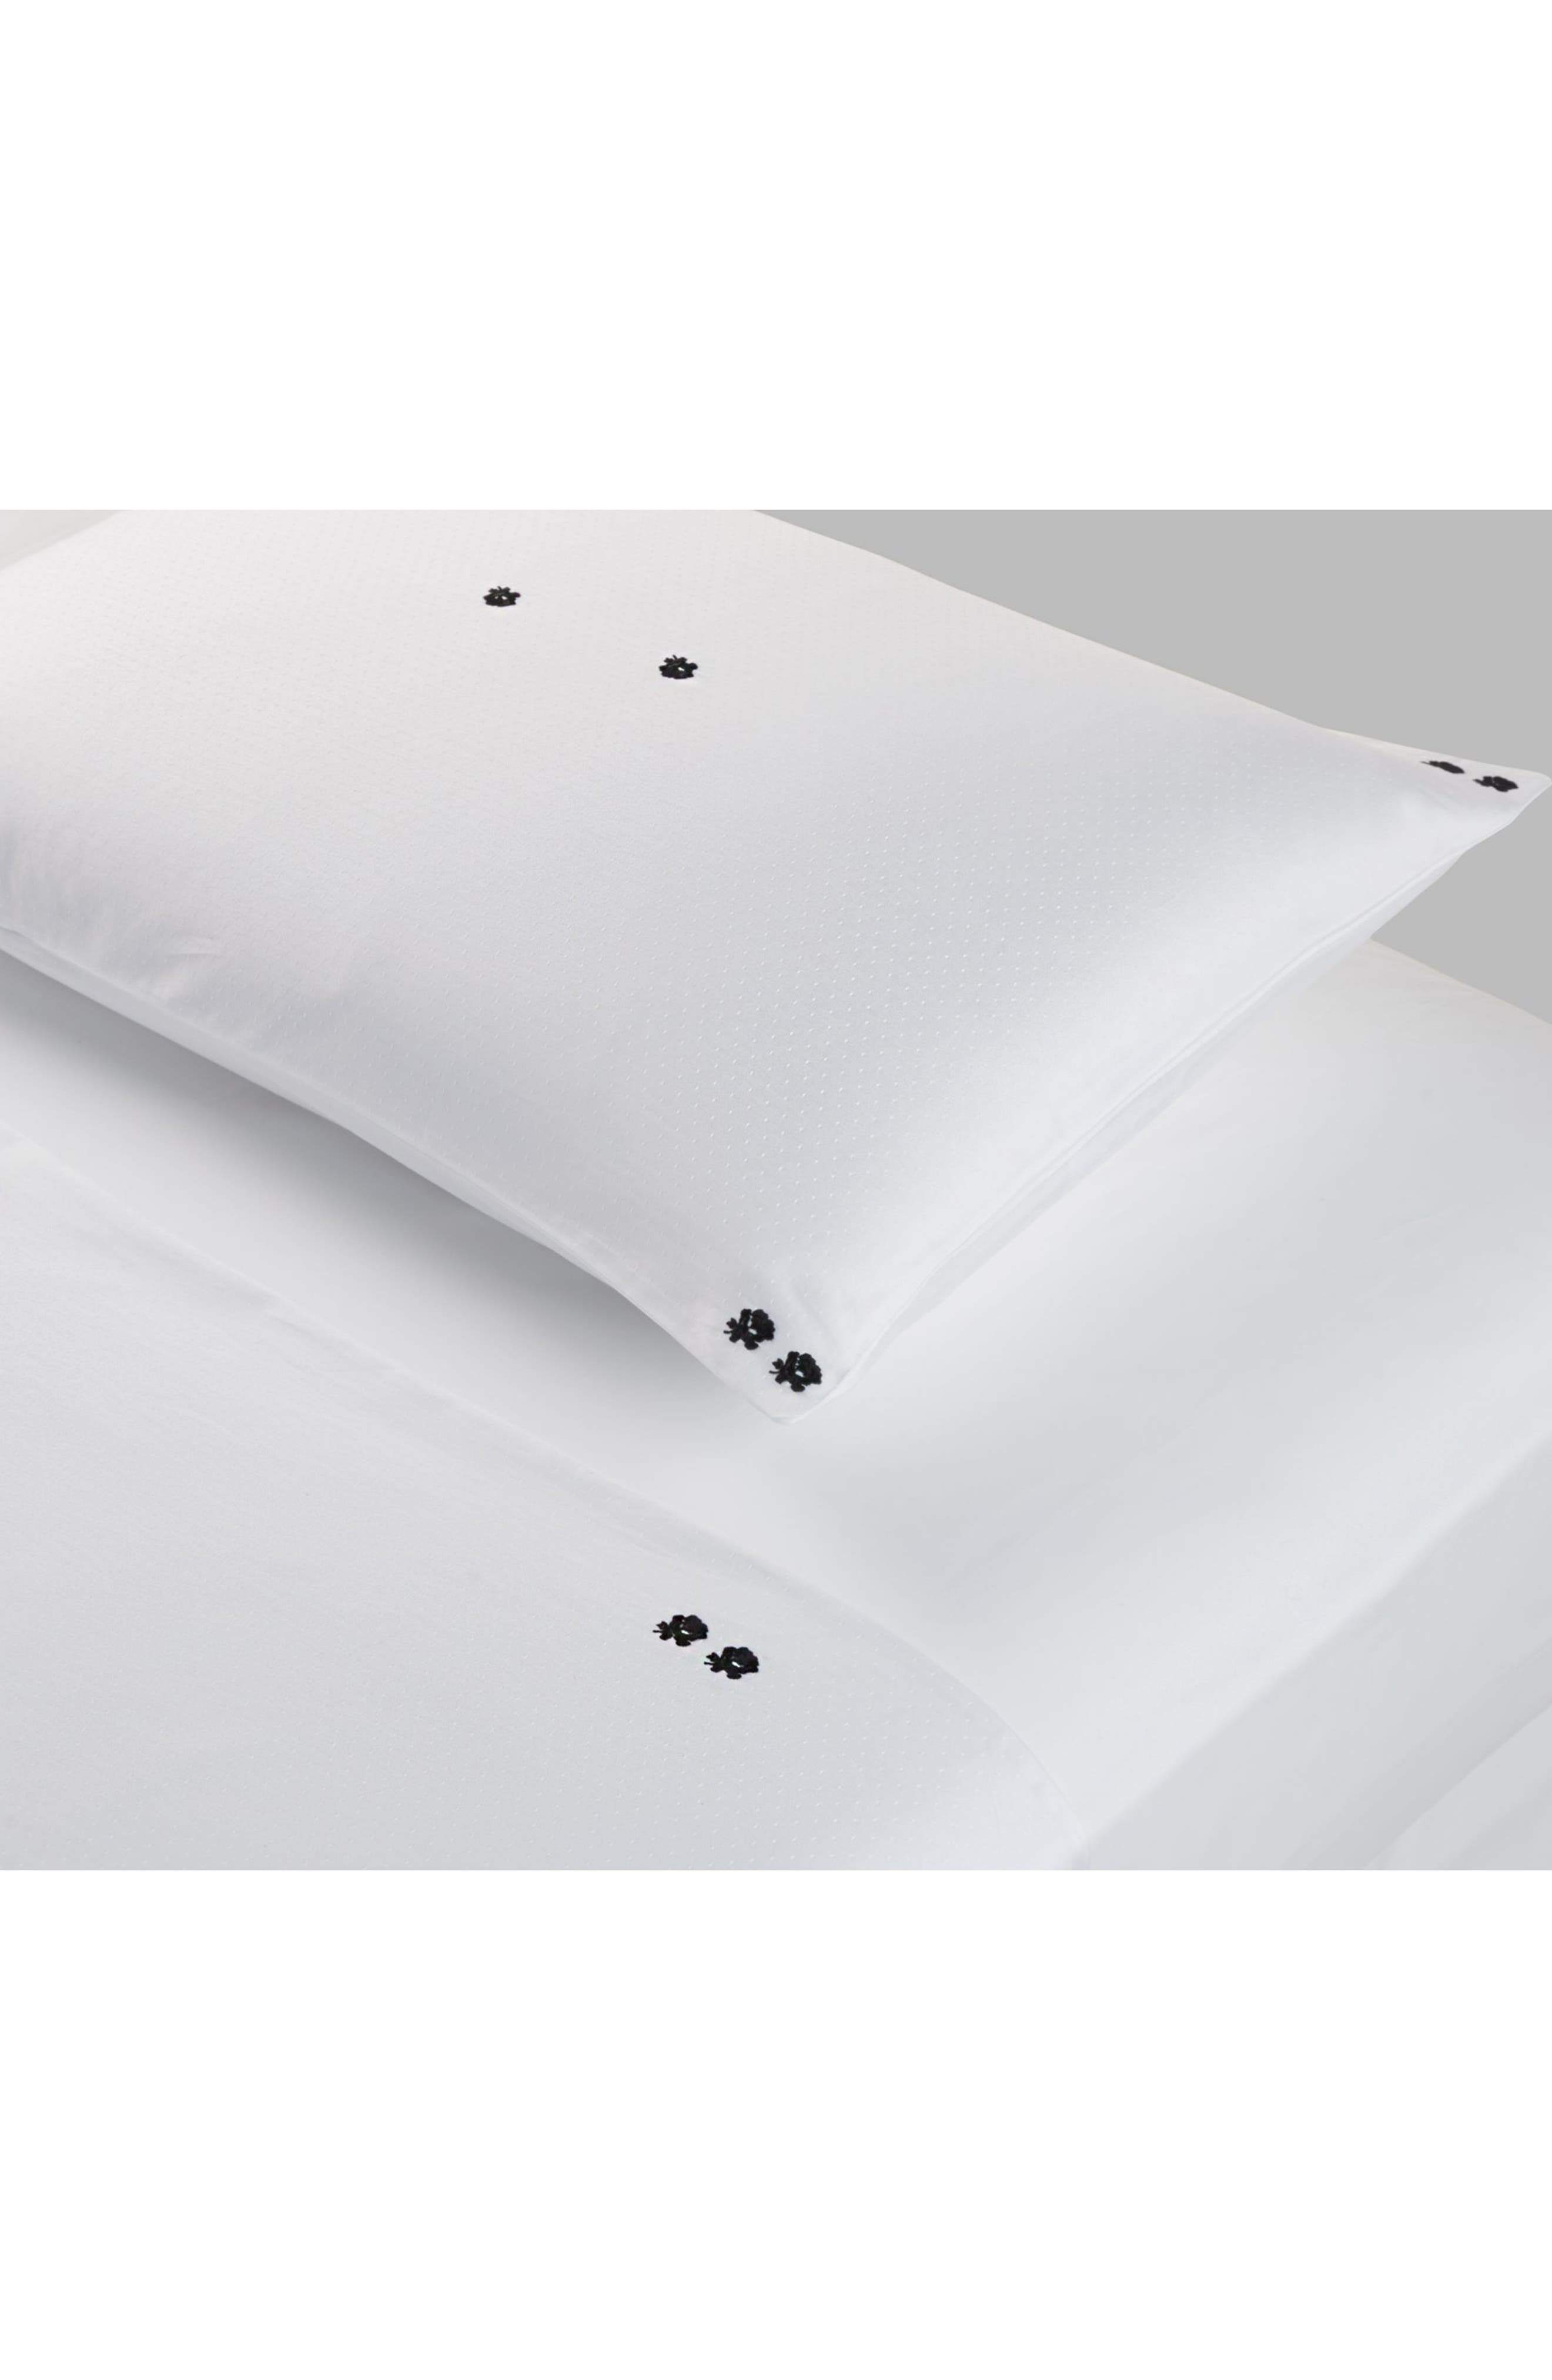 Clone Comforter,                             Alternate thumbnail 4, color,                             White